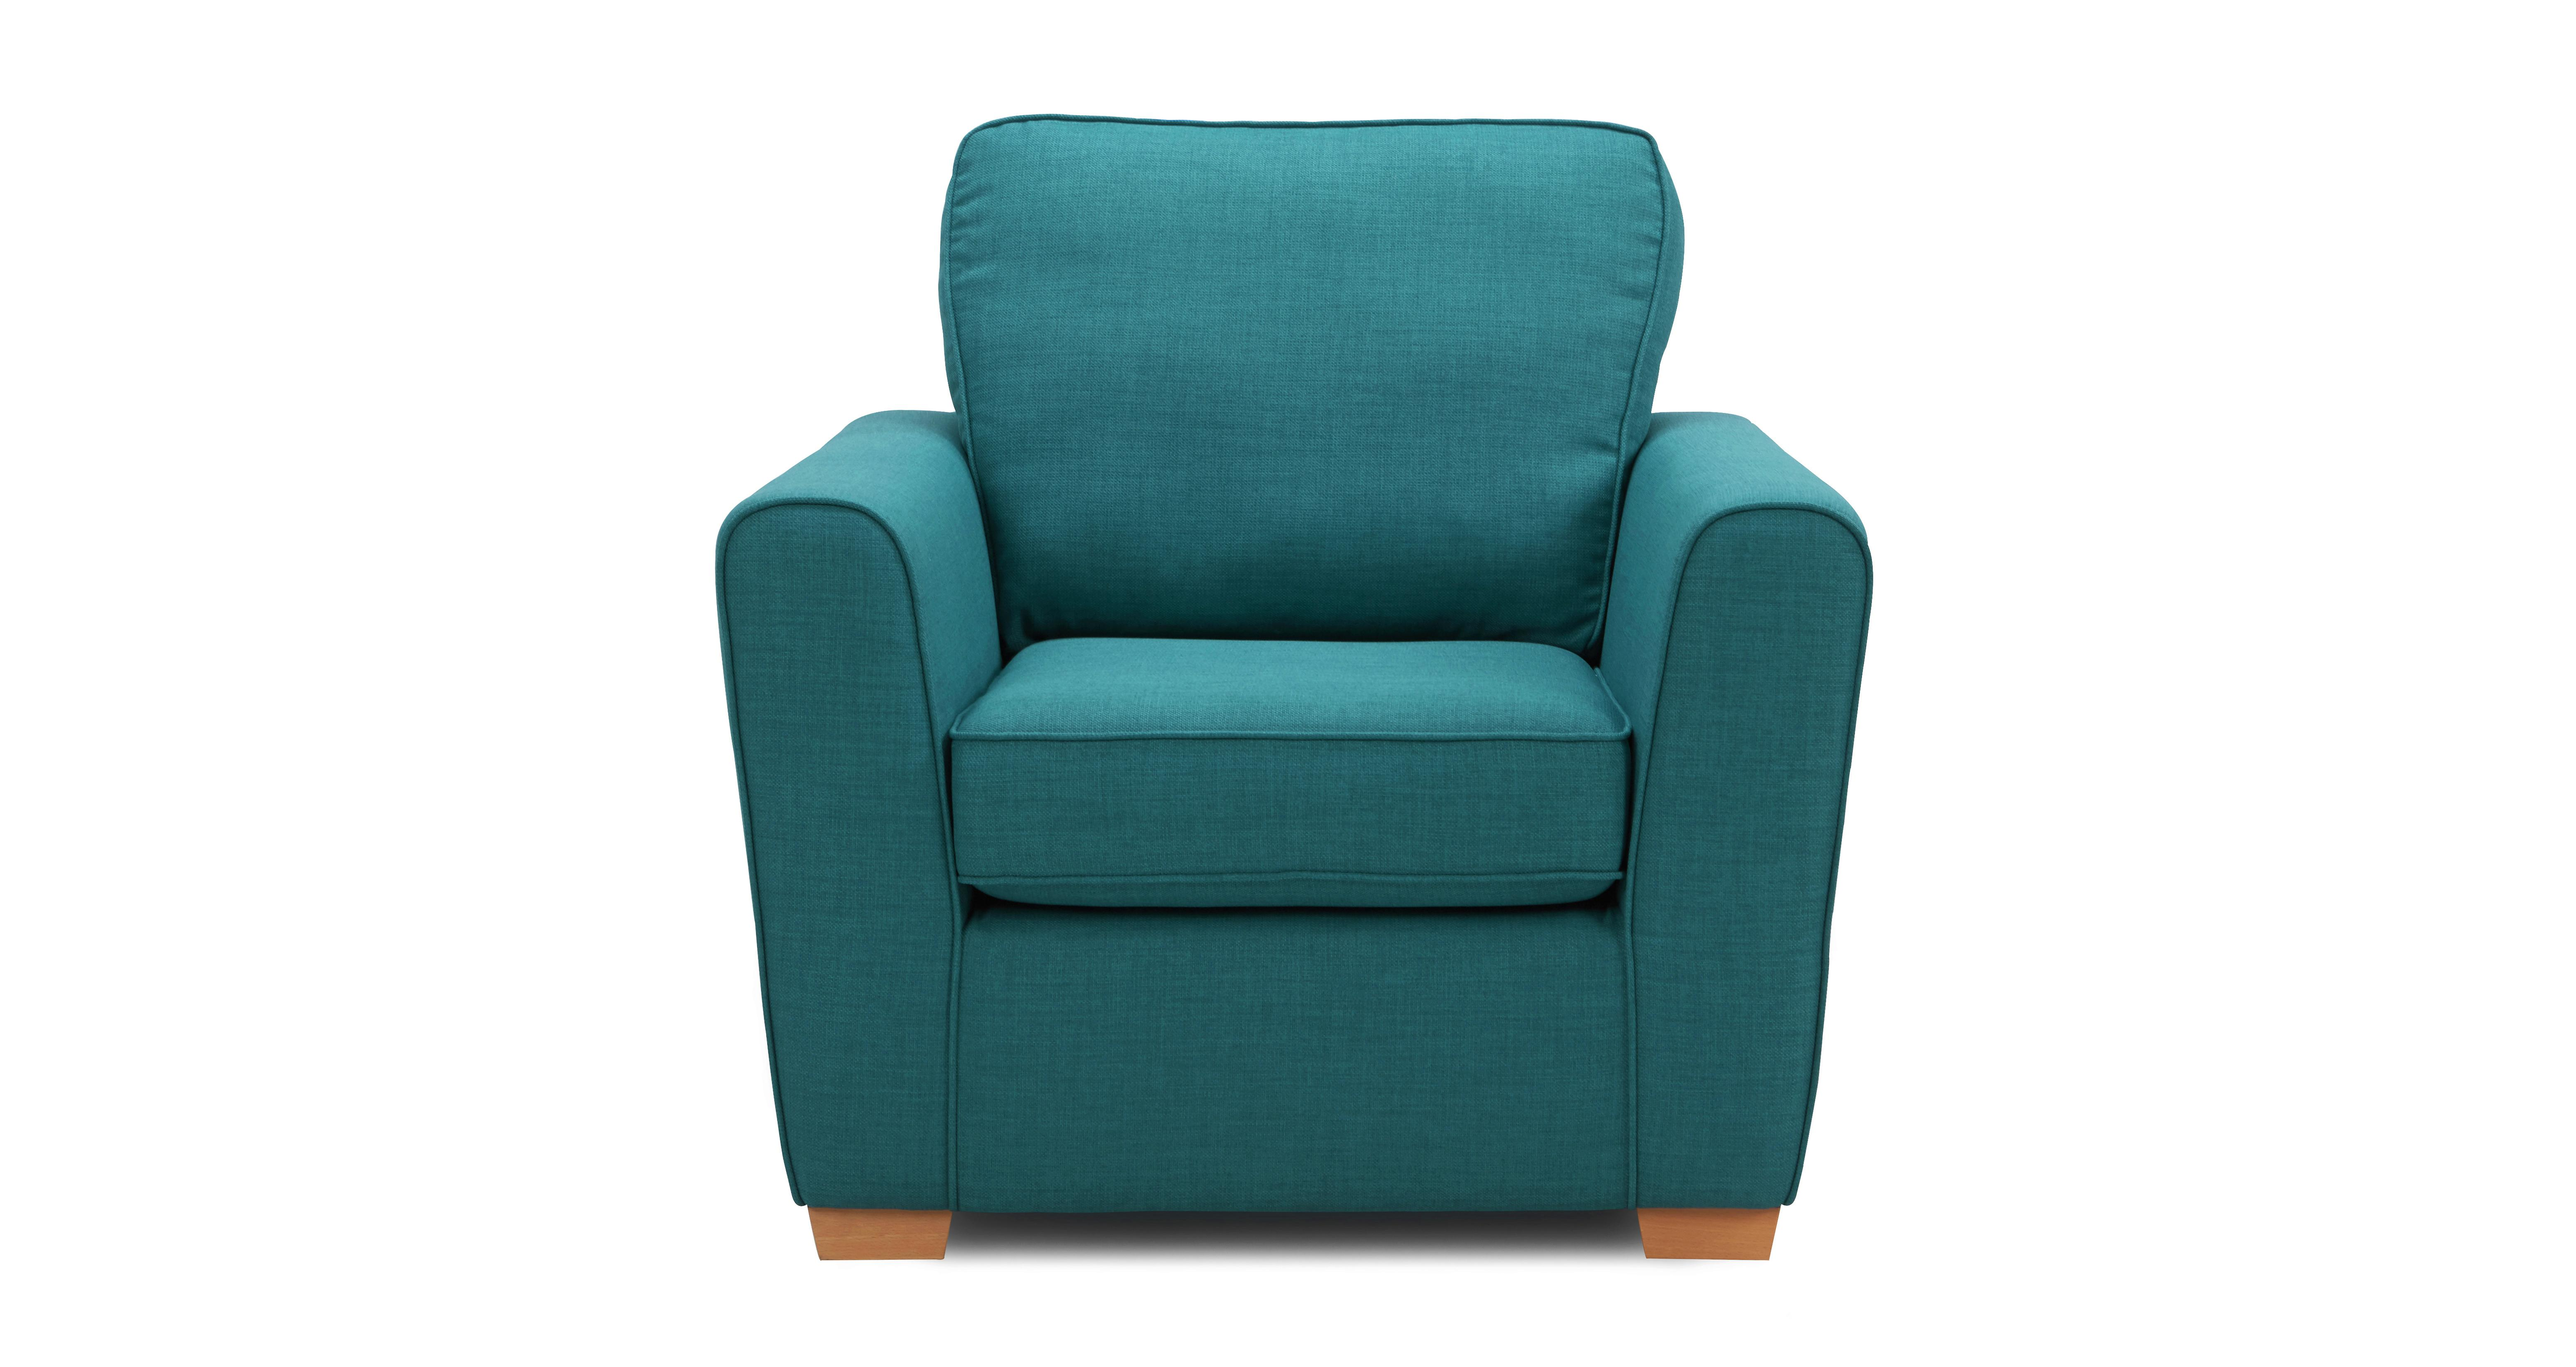 Adora Armchair Revive | DFS Ireland